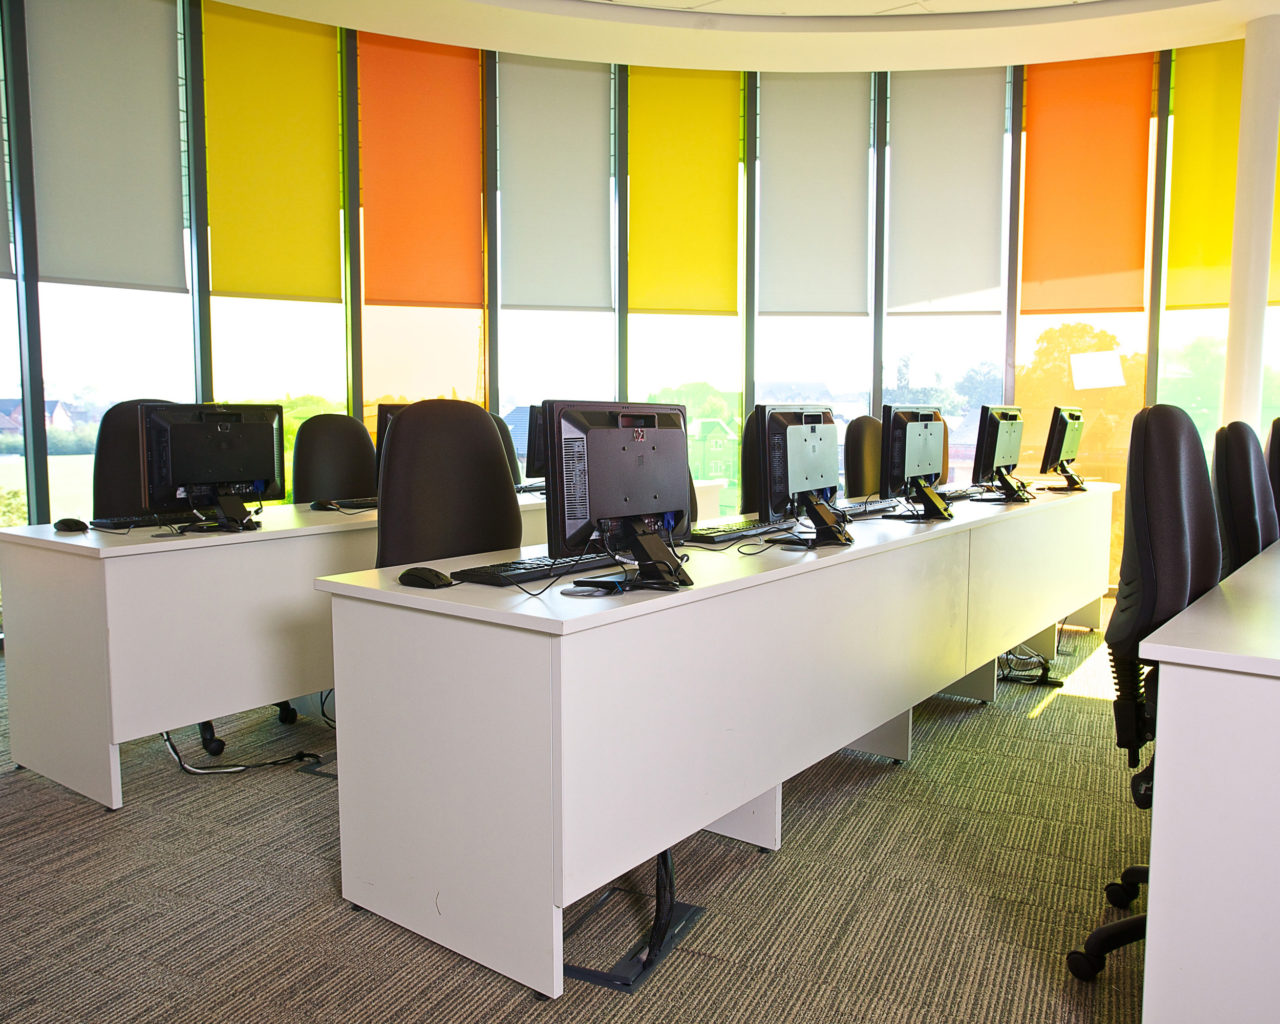 ICT Suites Yorkshire, Leeds, Huddersfield, Halifax, Bradford, Wakefield.